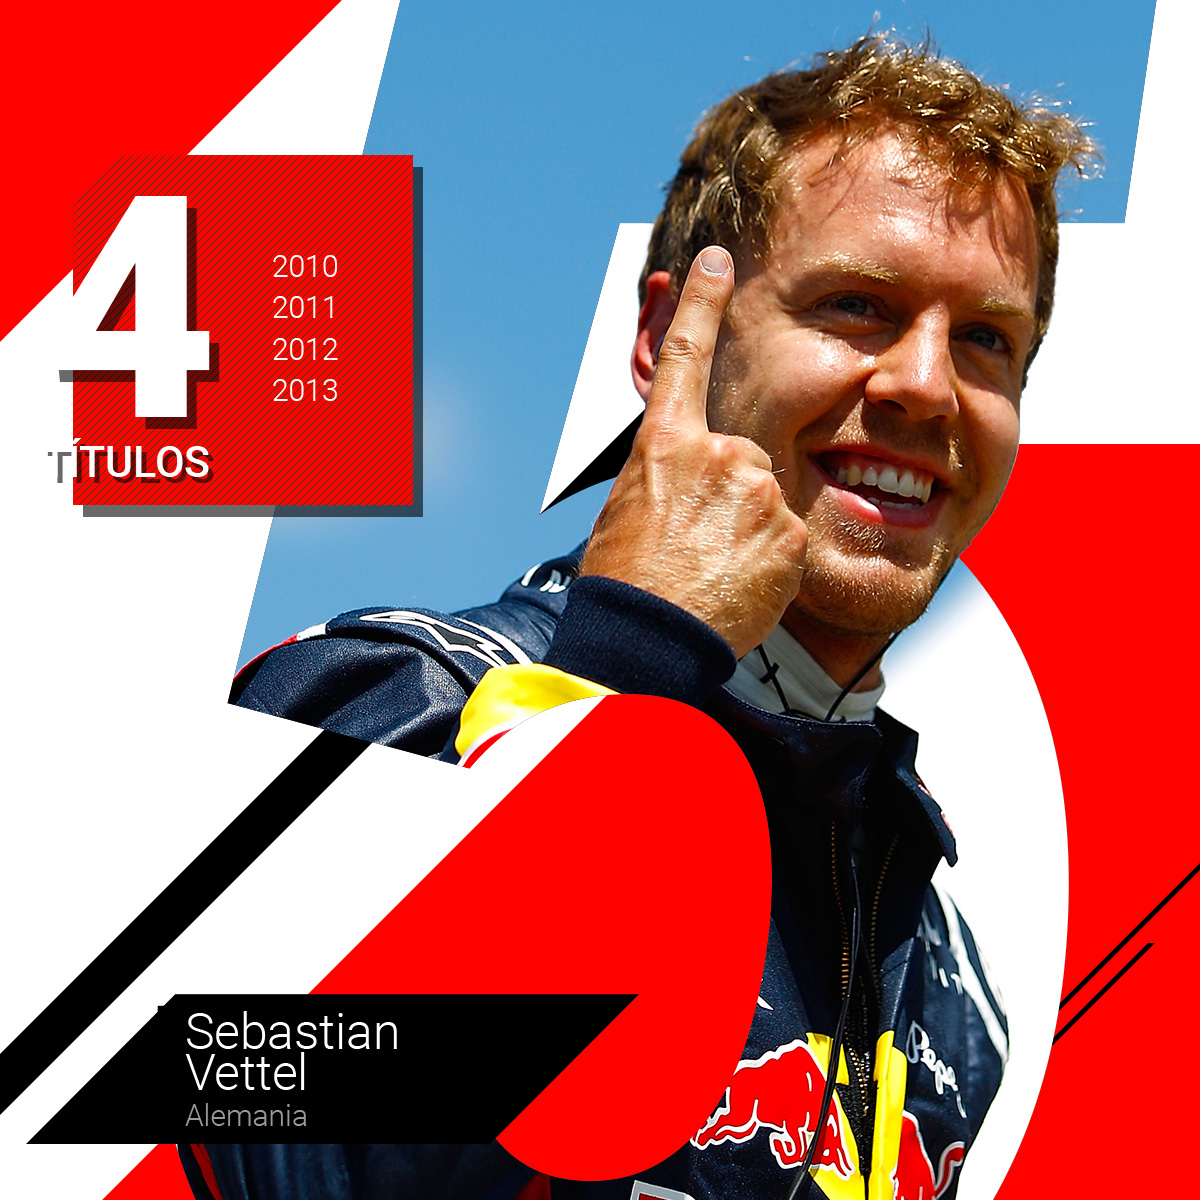 Sebastian Vettel, rey de la Fórmula 1 mientras estuvo en Red Bull